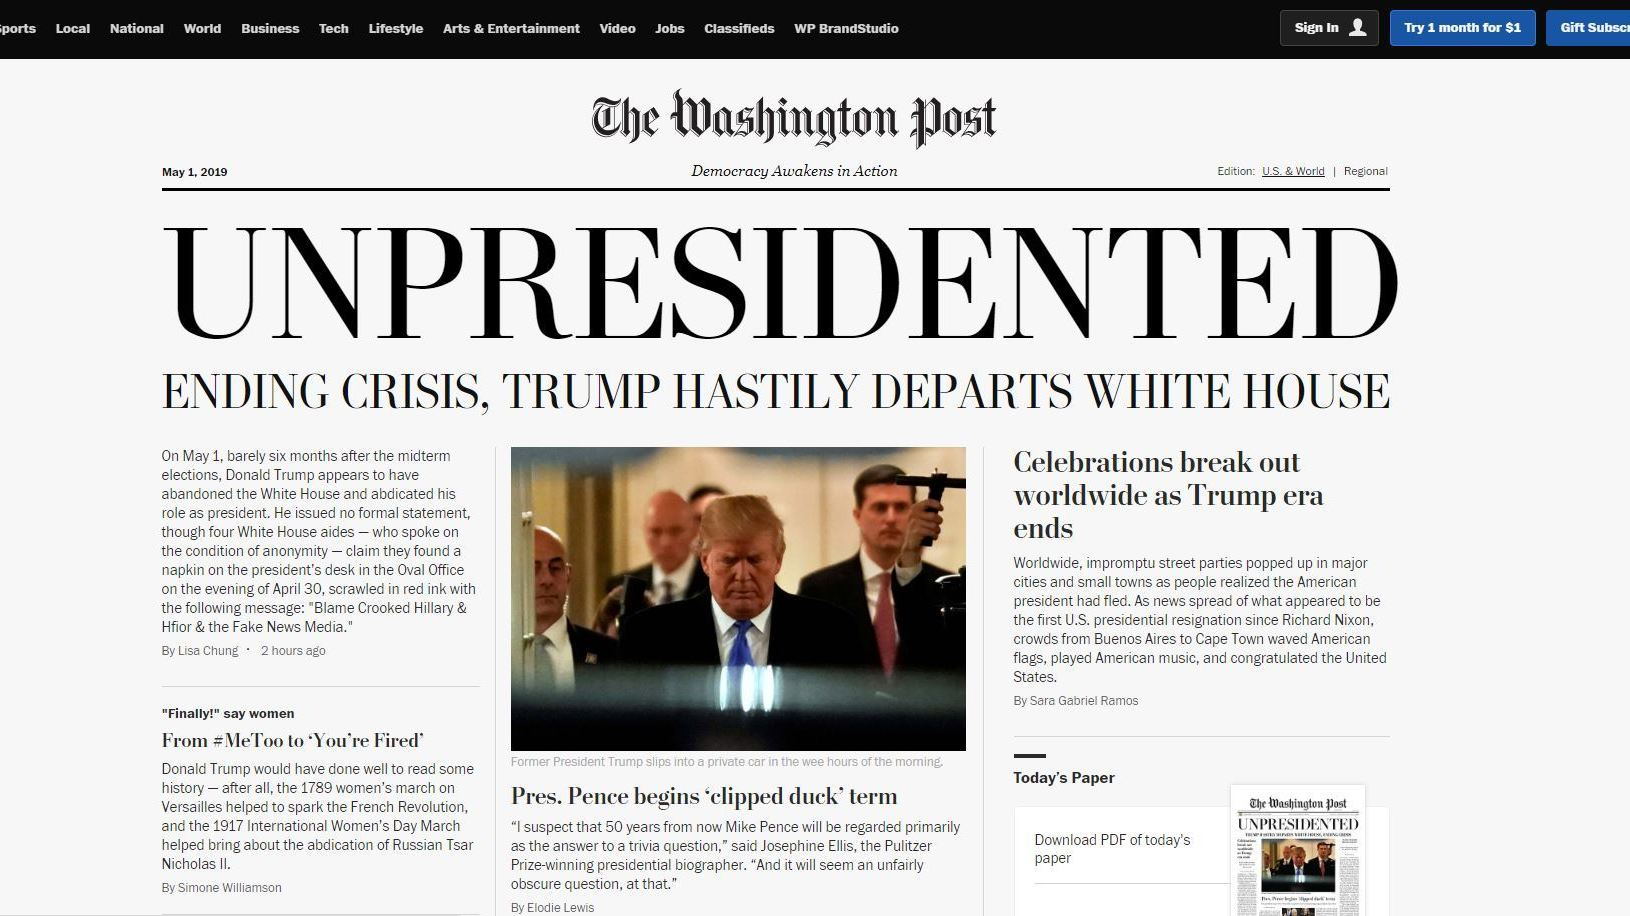 npr.org - Ian Stewart - Real Fake News: Activists Circulate Counterfeit Editions Of 'The Washington Post